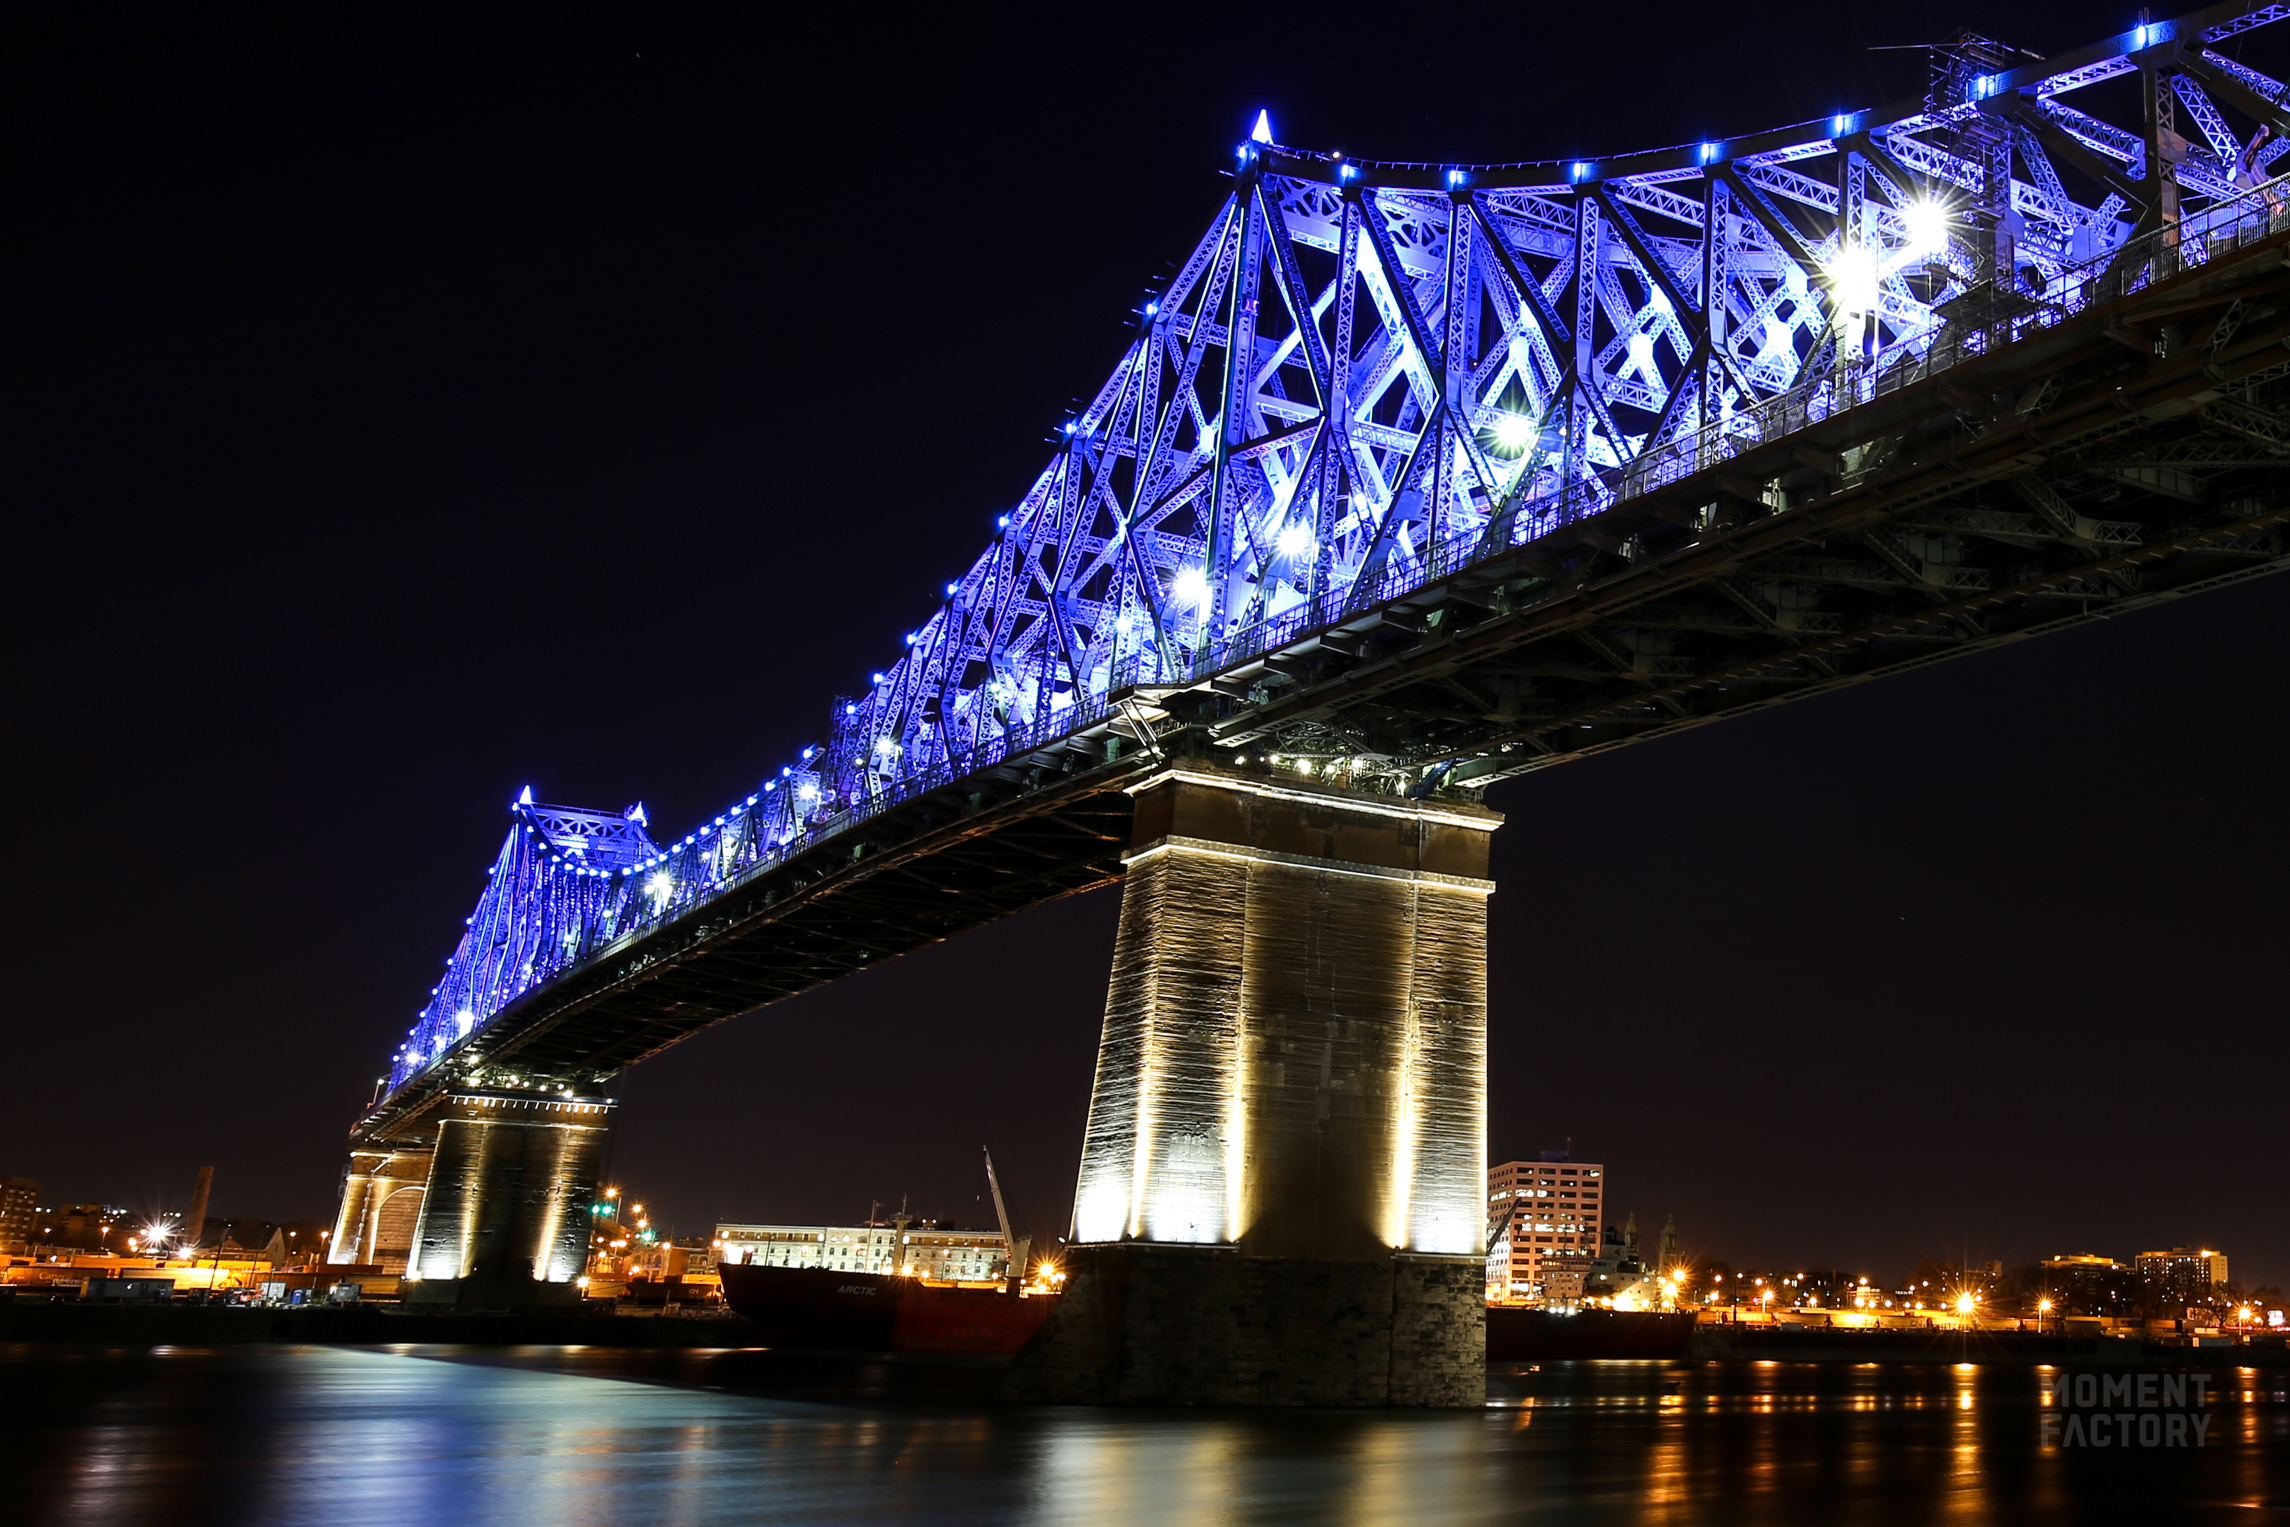 Jacques Cartier Bridge Illumination Reflects The Vibrant